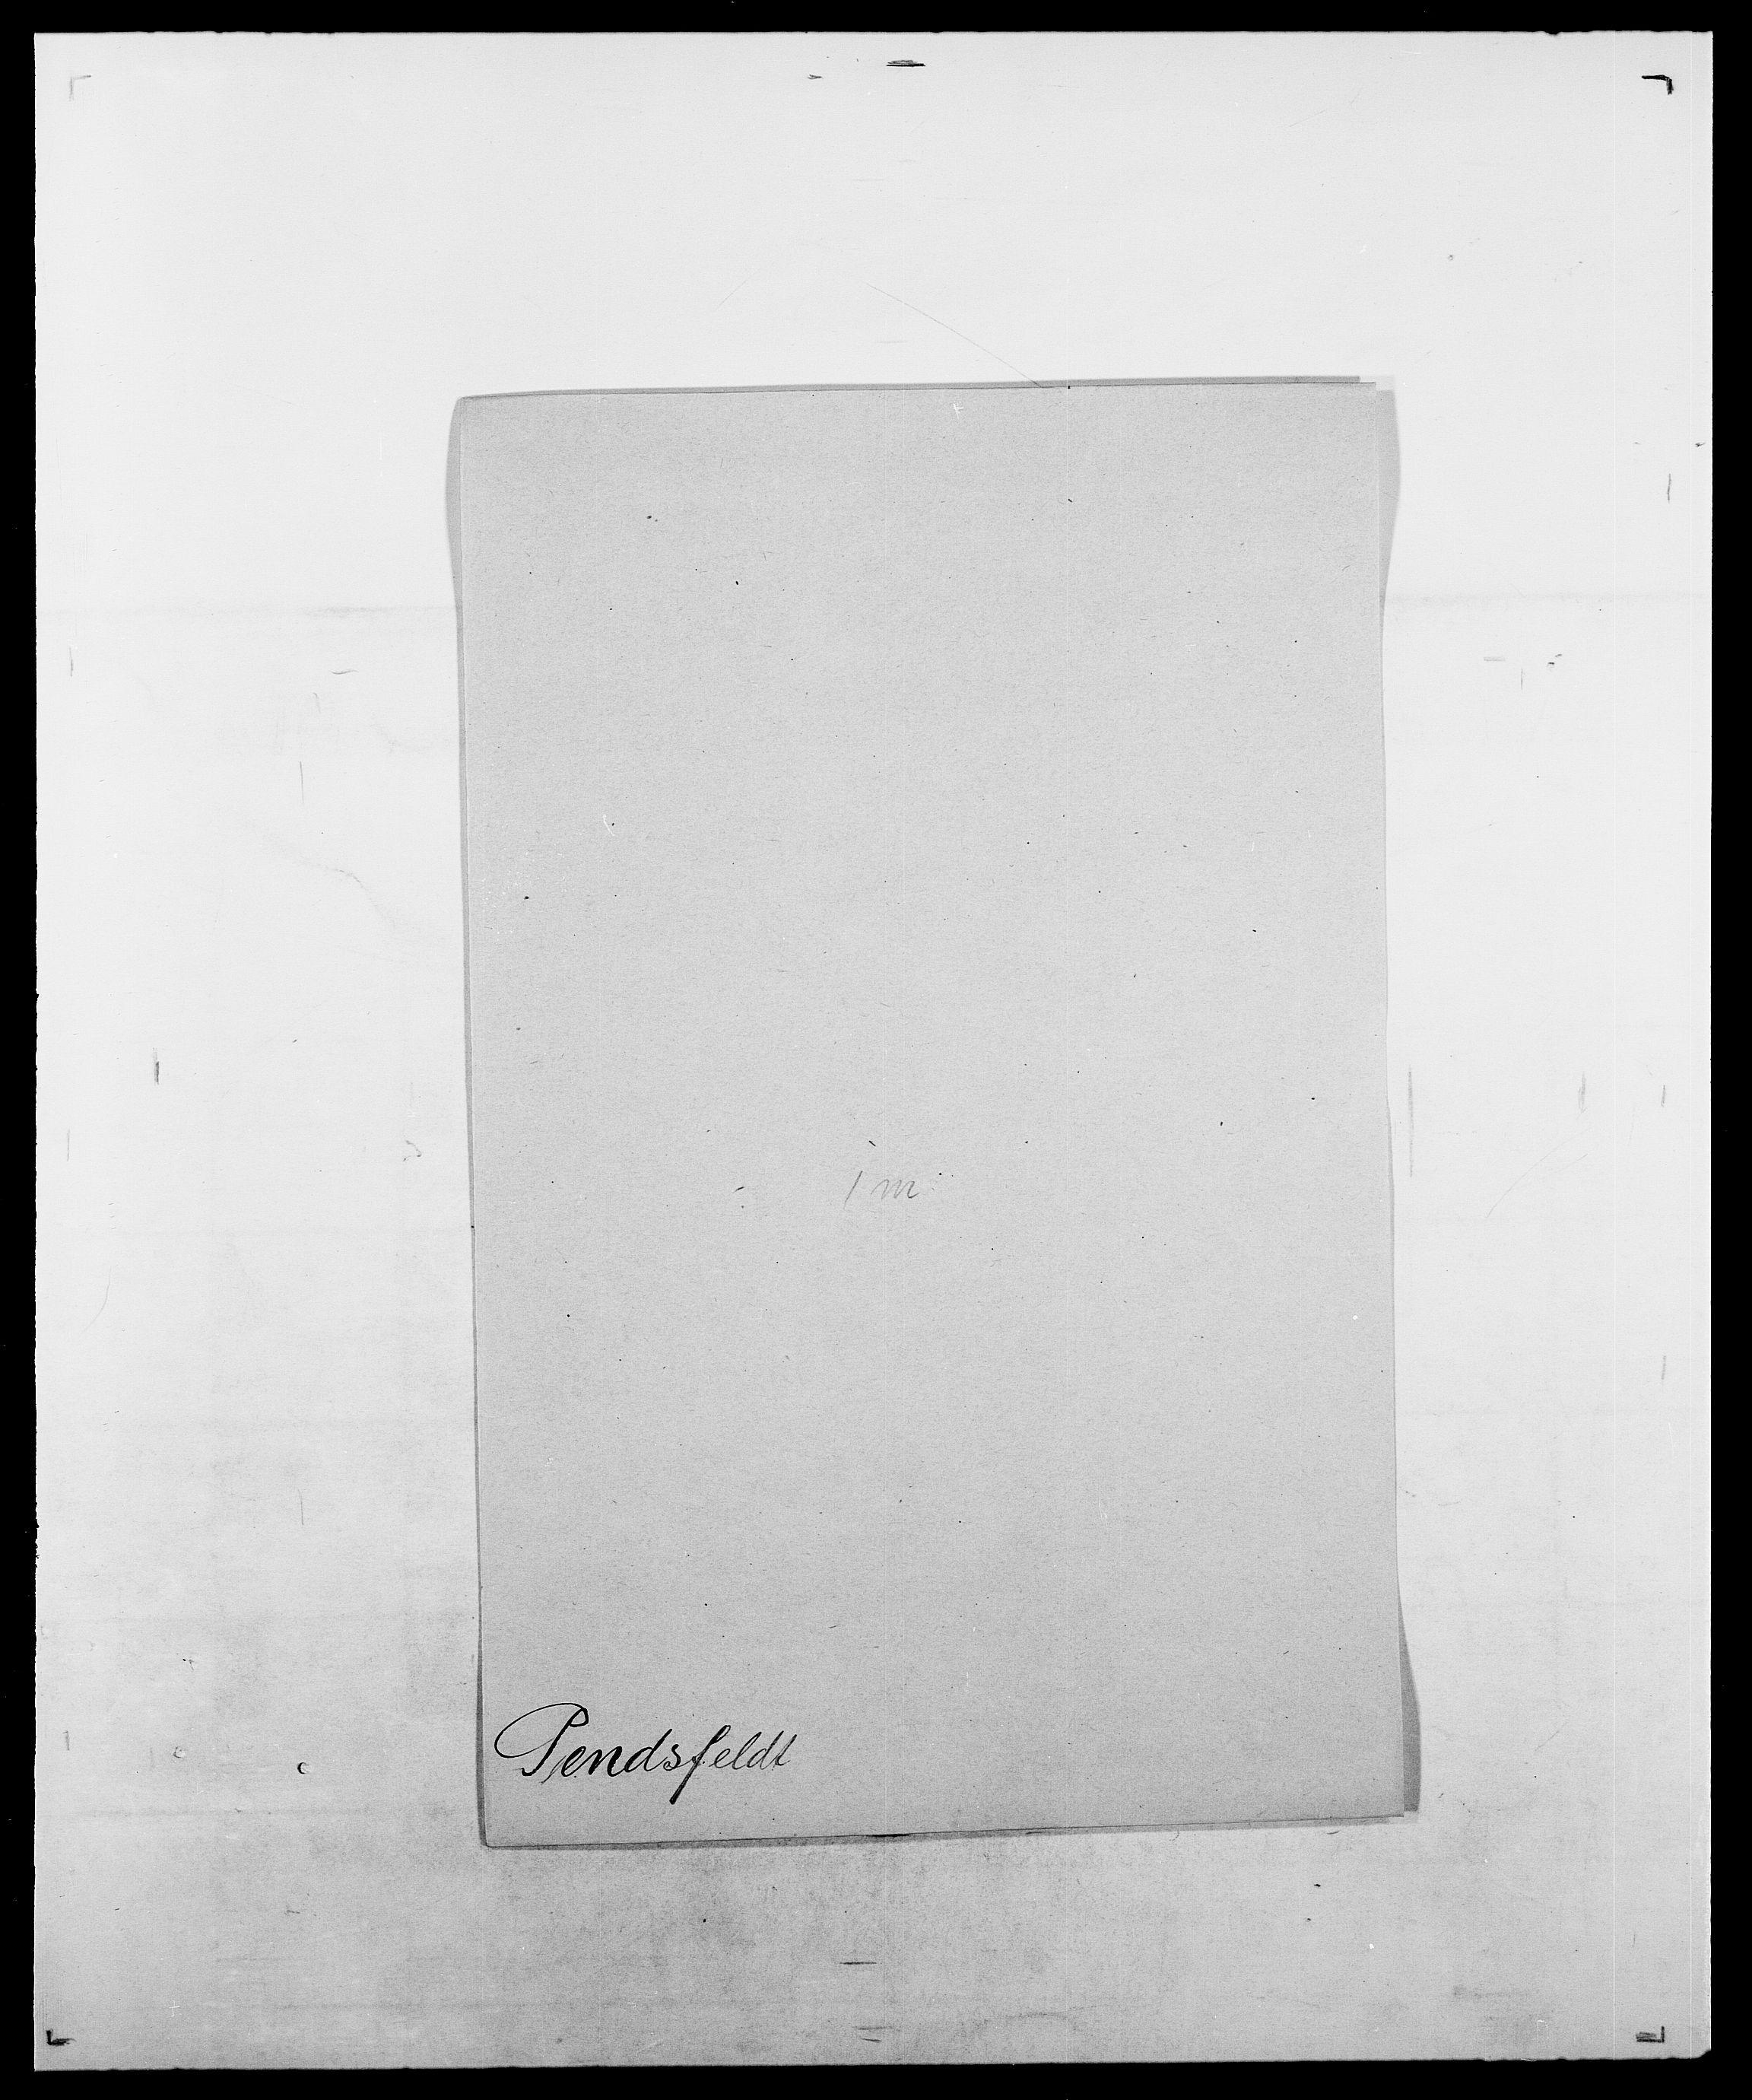 SAO, Delgobe, Charles Antoine - samling, D/Da/L0030: Paars - Pittelkov, s. 342